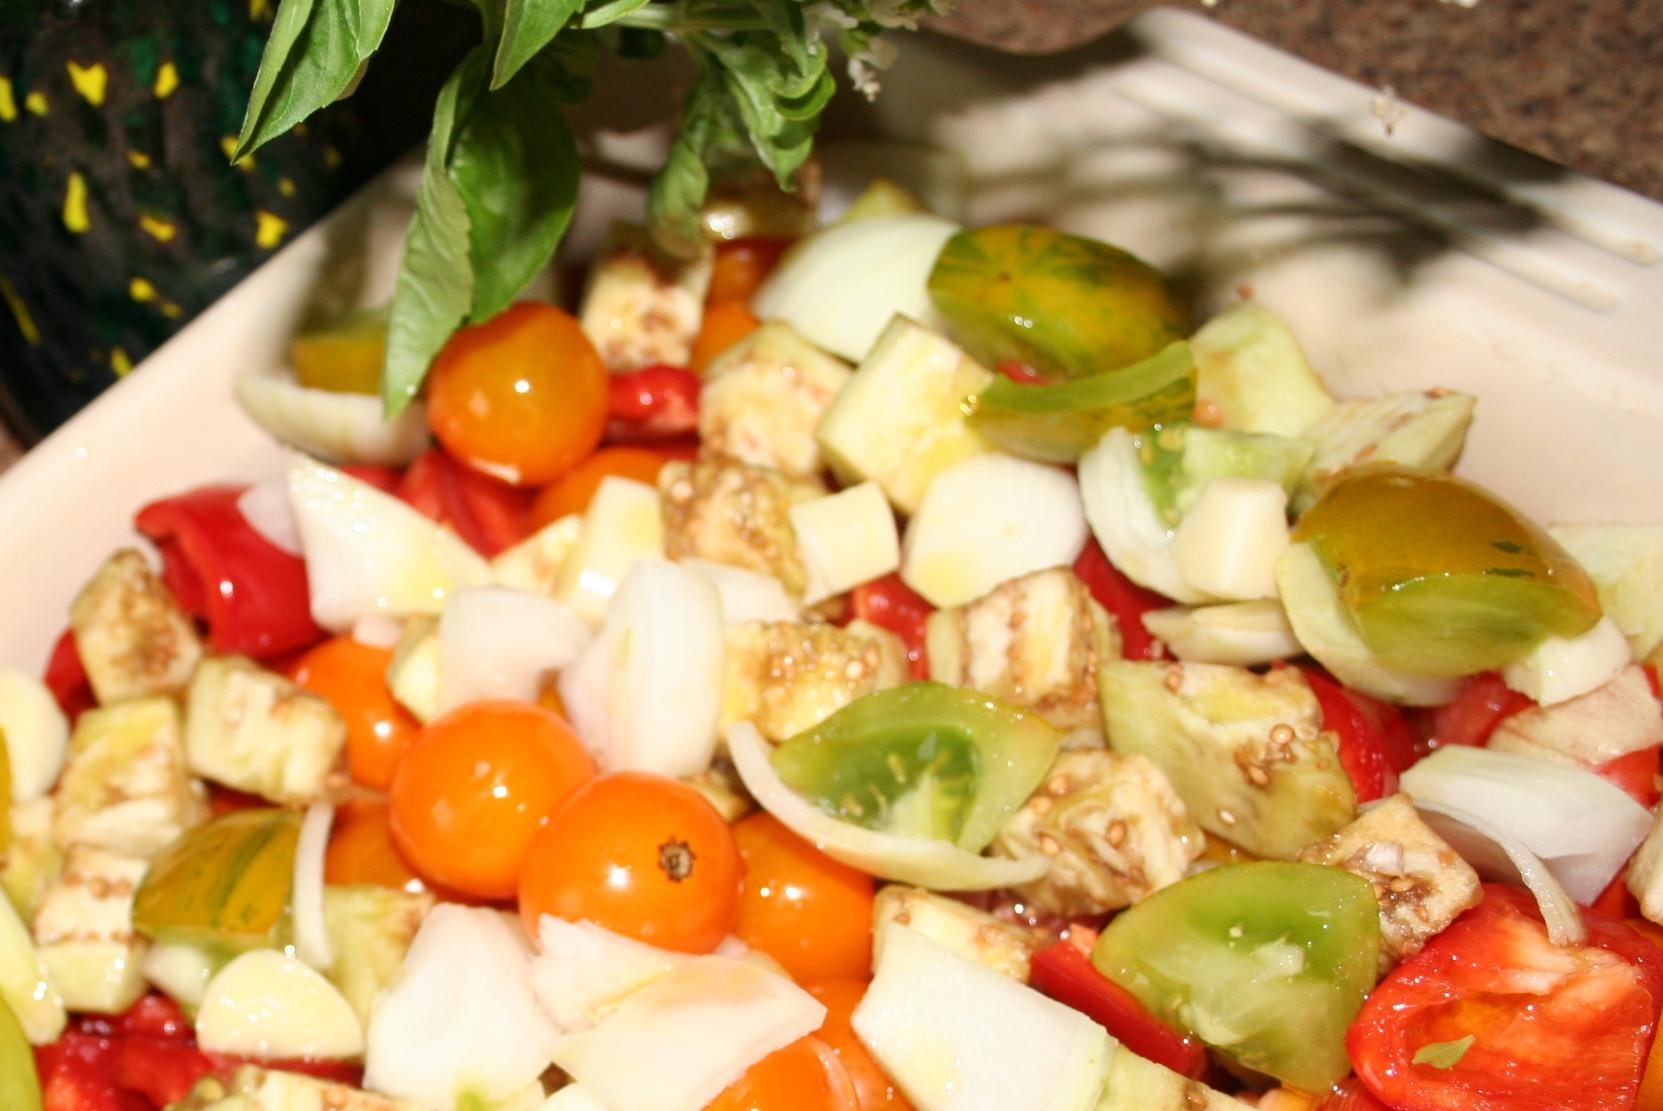 Roasted Tomato - Copy.JPG